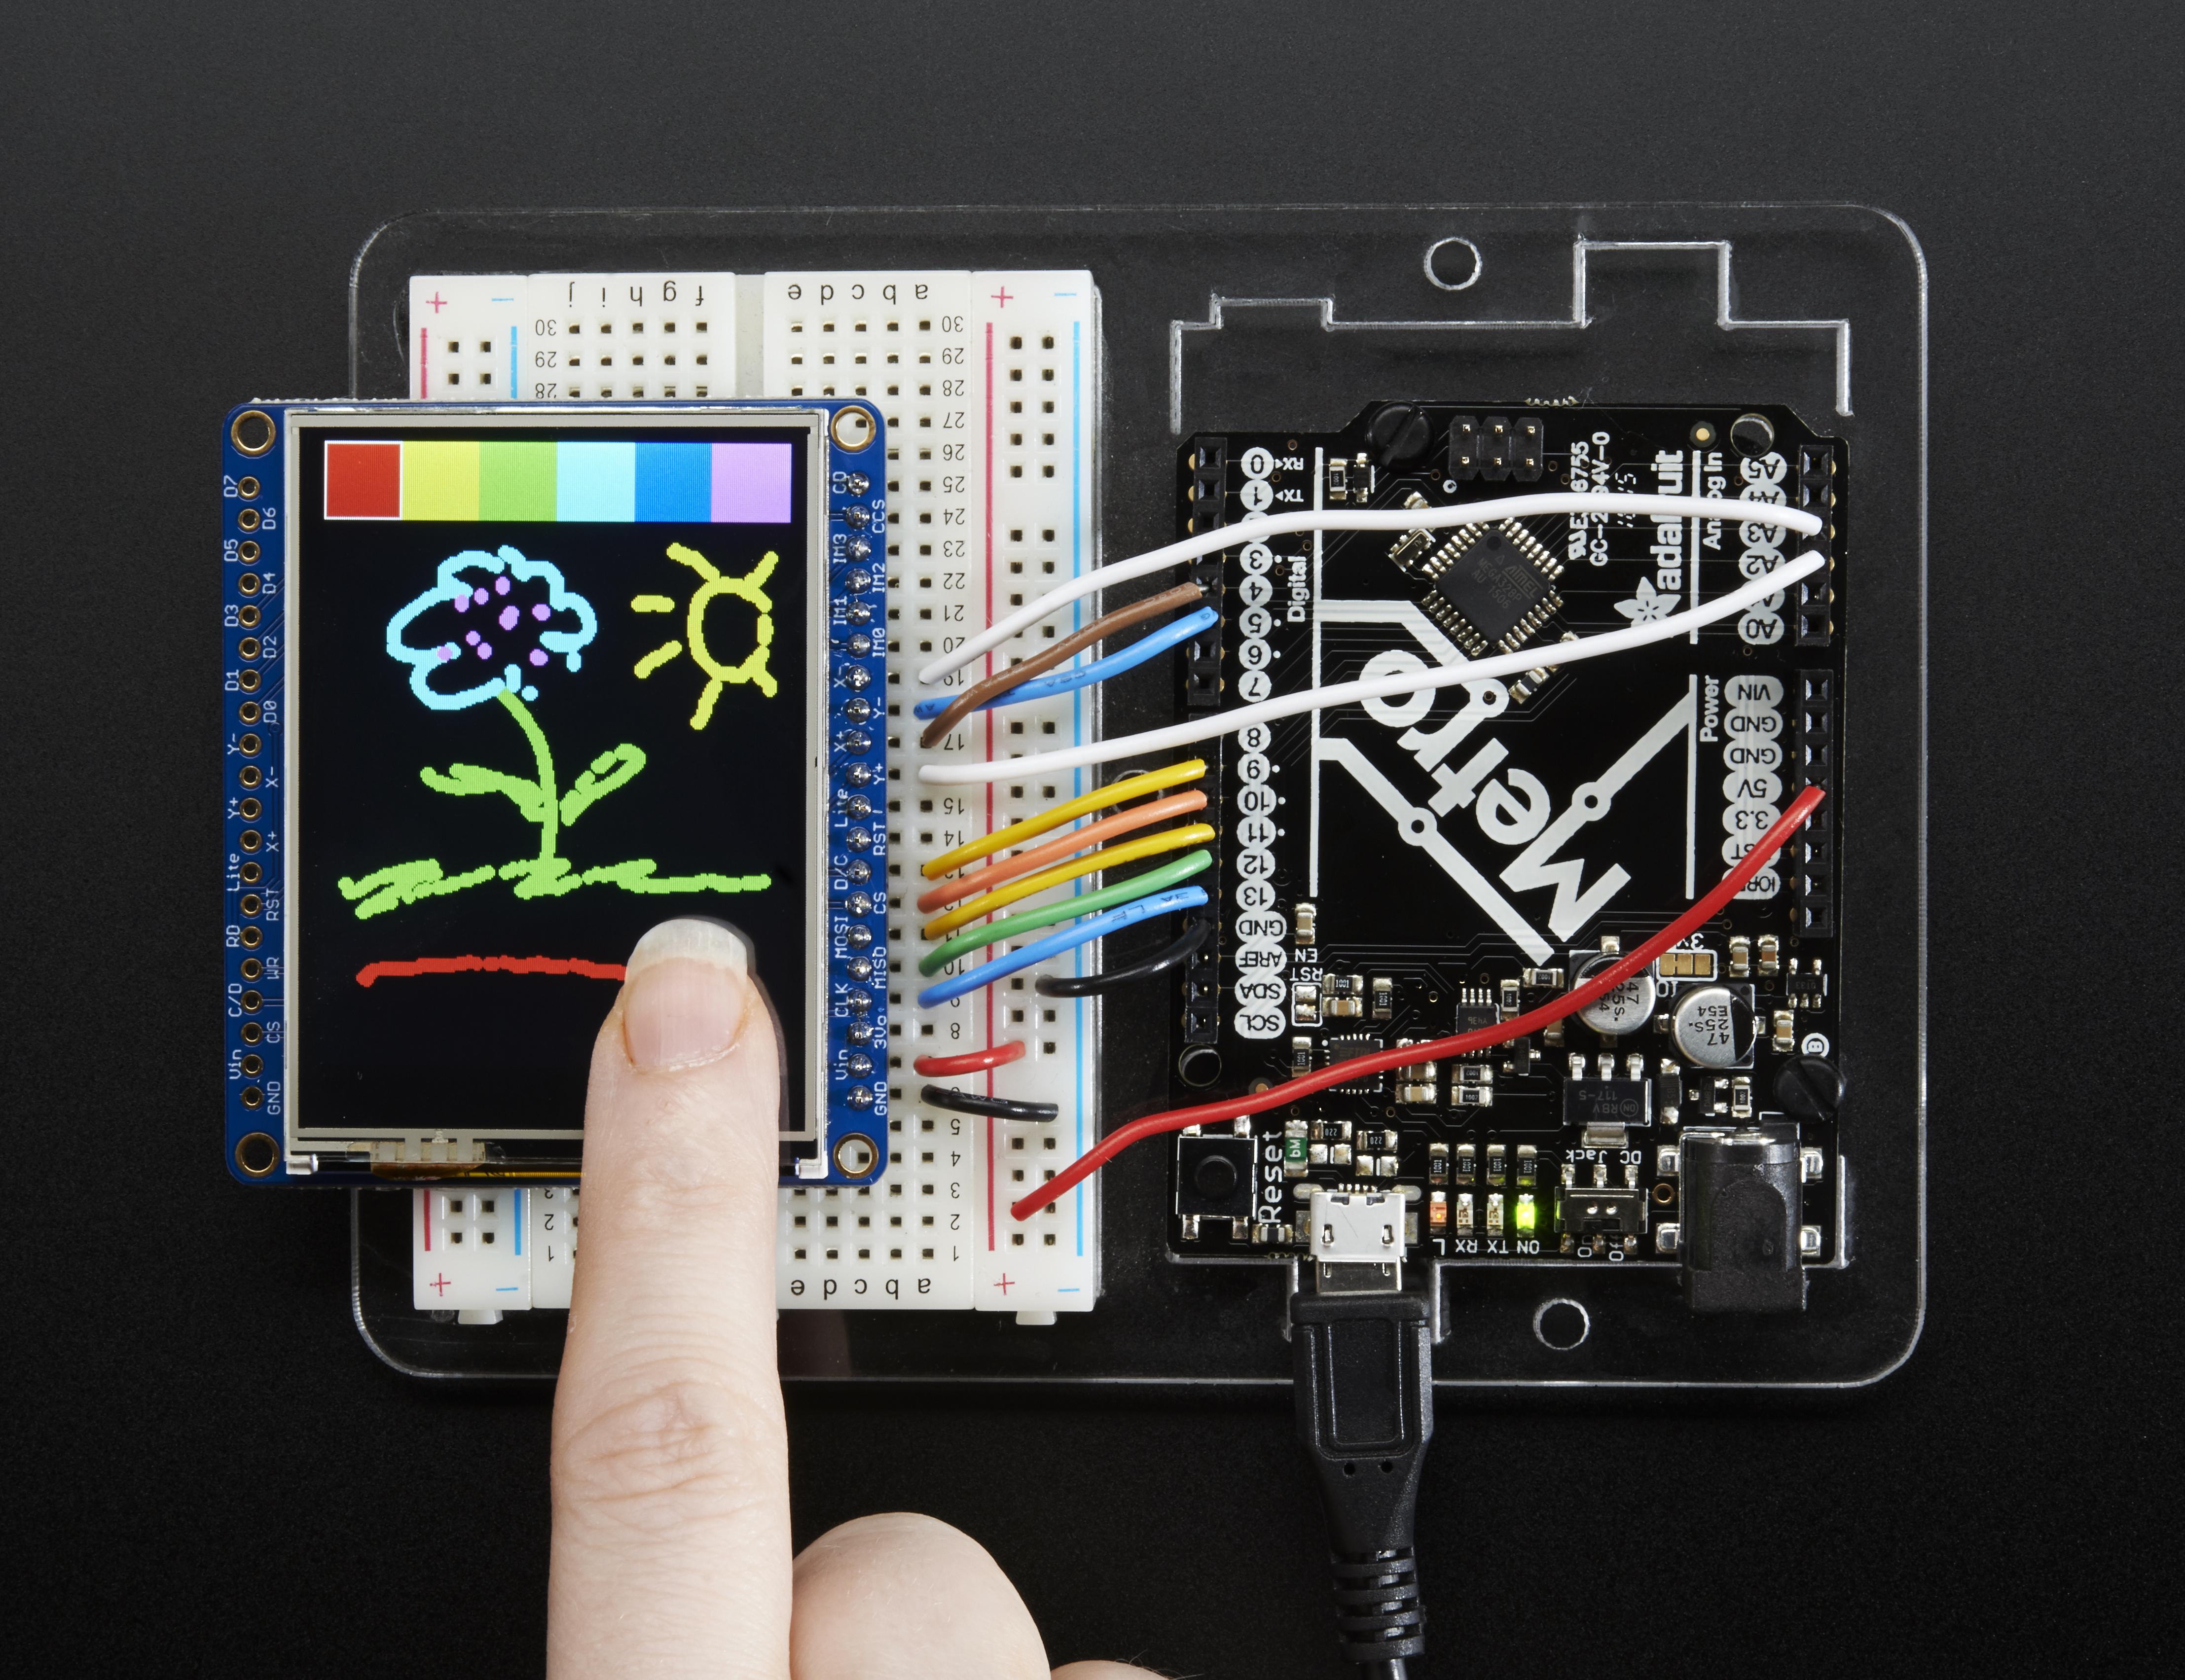 adafruit_products_2478_screen_10_hand_demo_ORIG.jpg